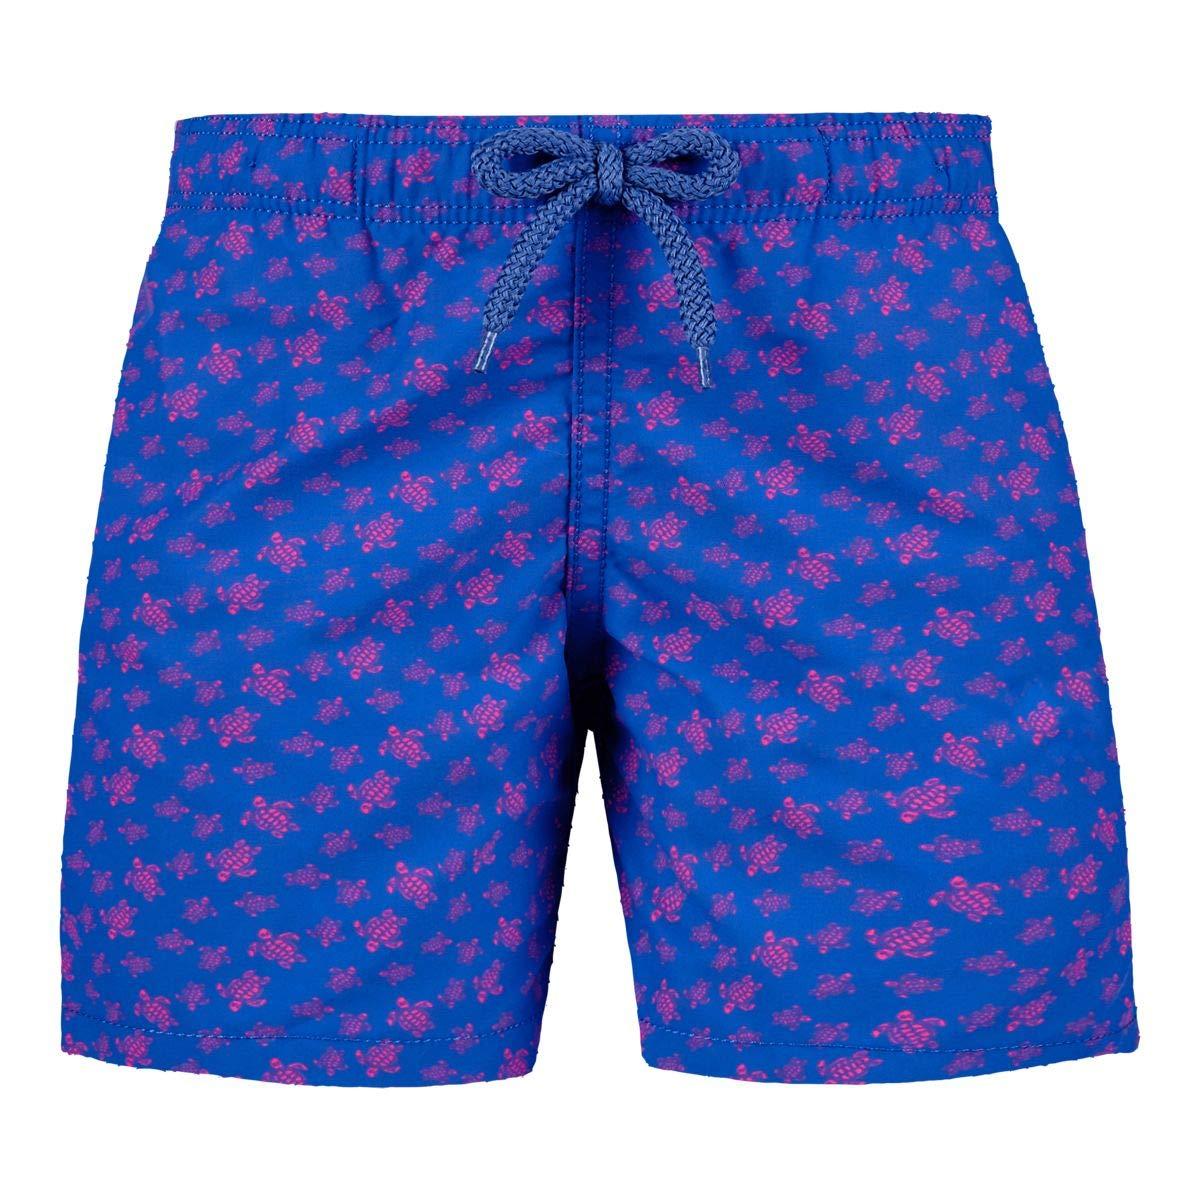 Vilebrequin Big Boys Kids Micro Ronde Des Tortues Swimtrunk-2 yrs, sea Blue, 2